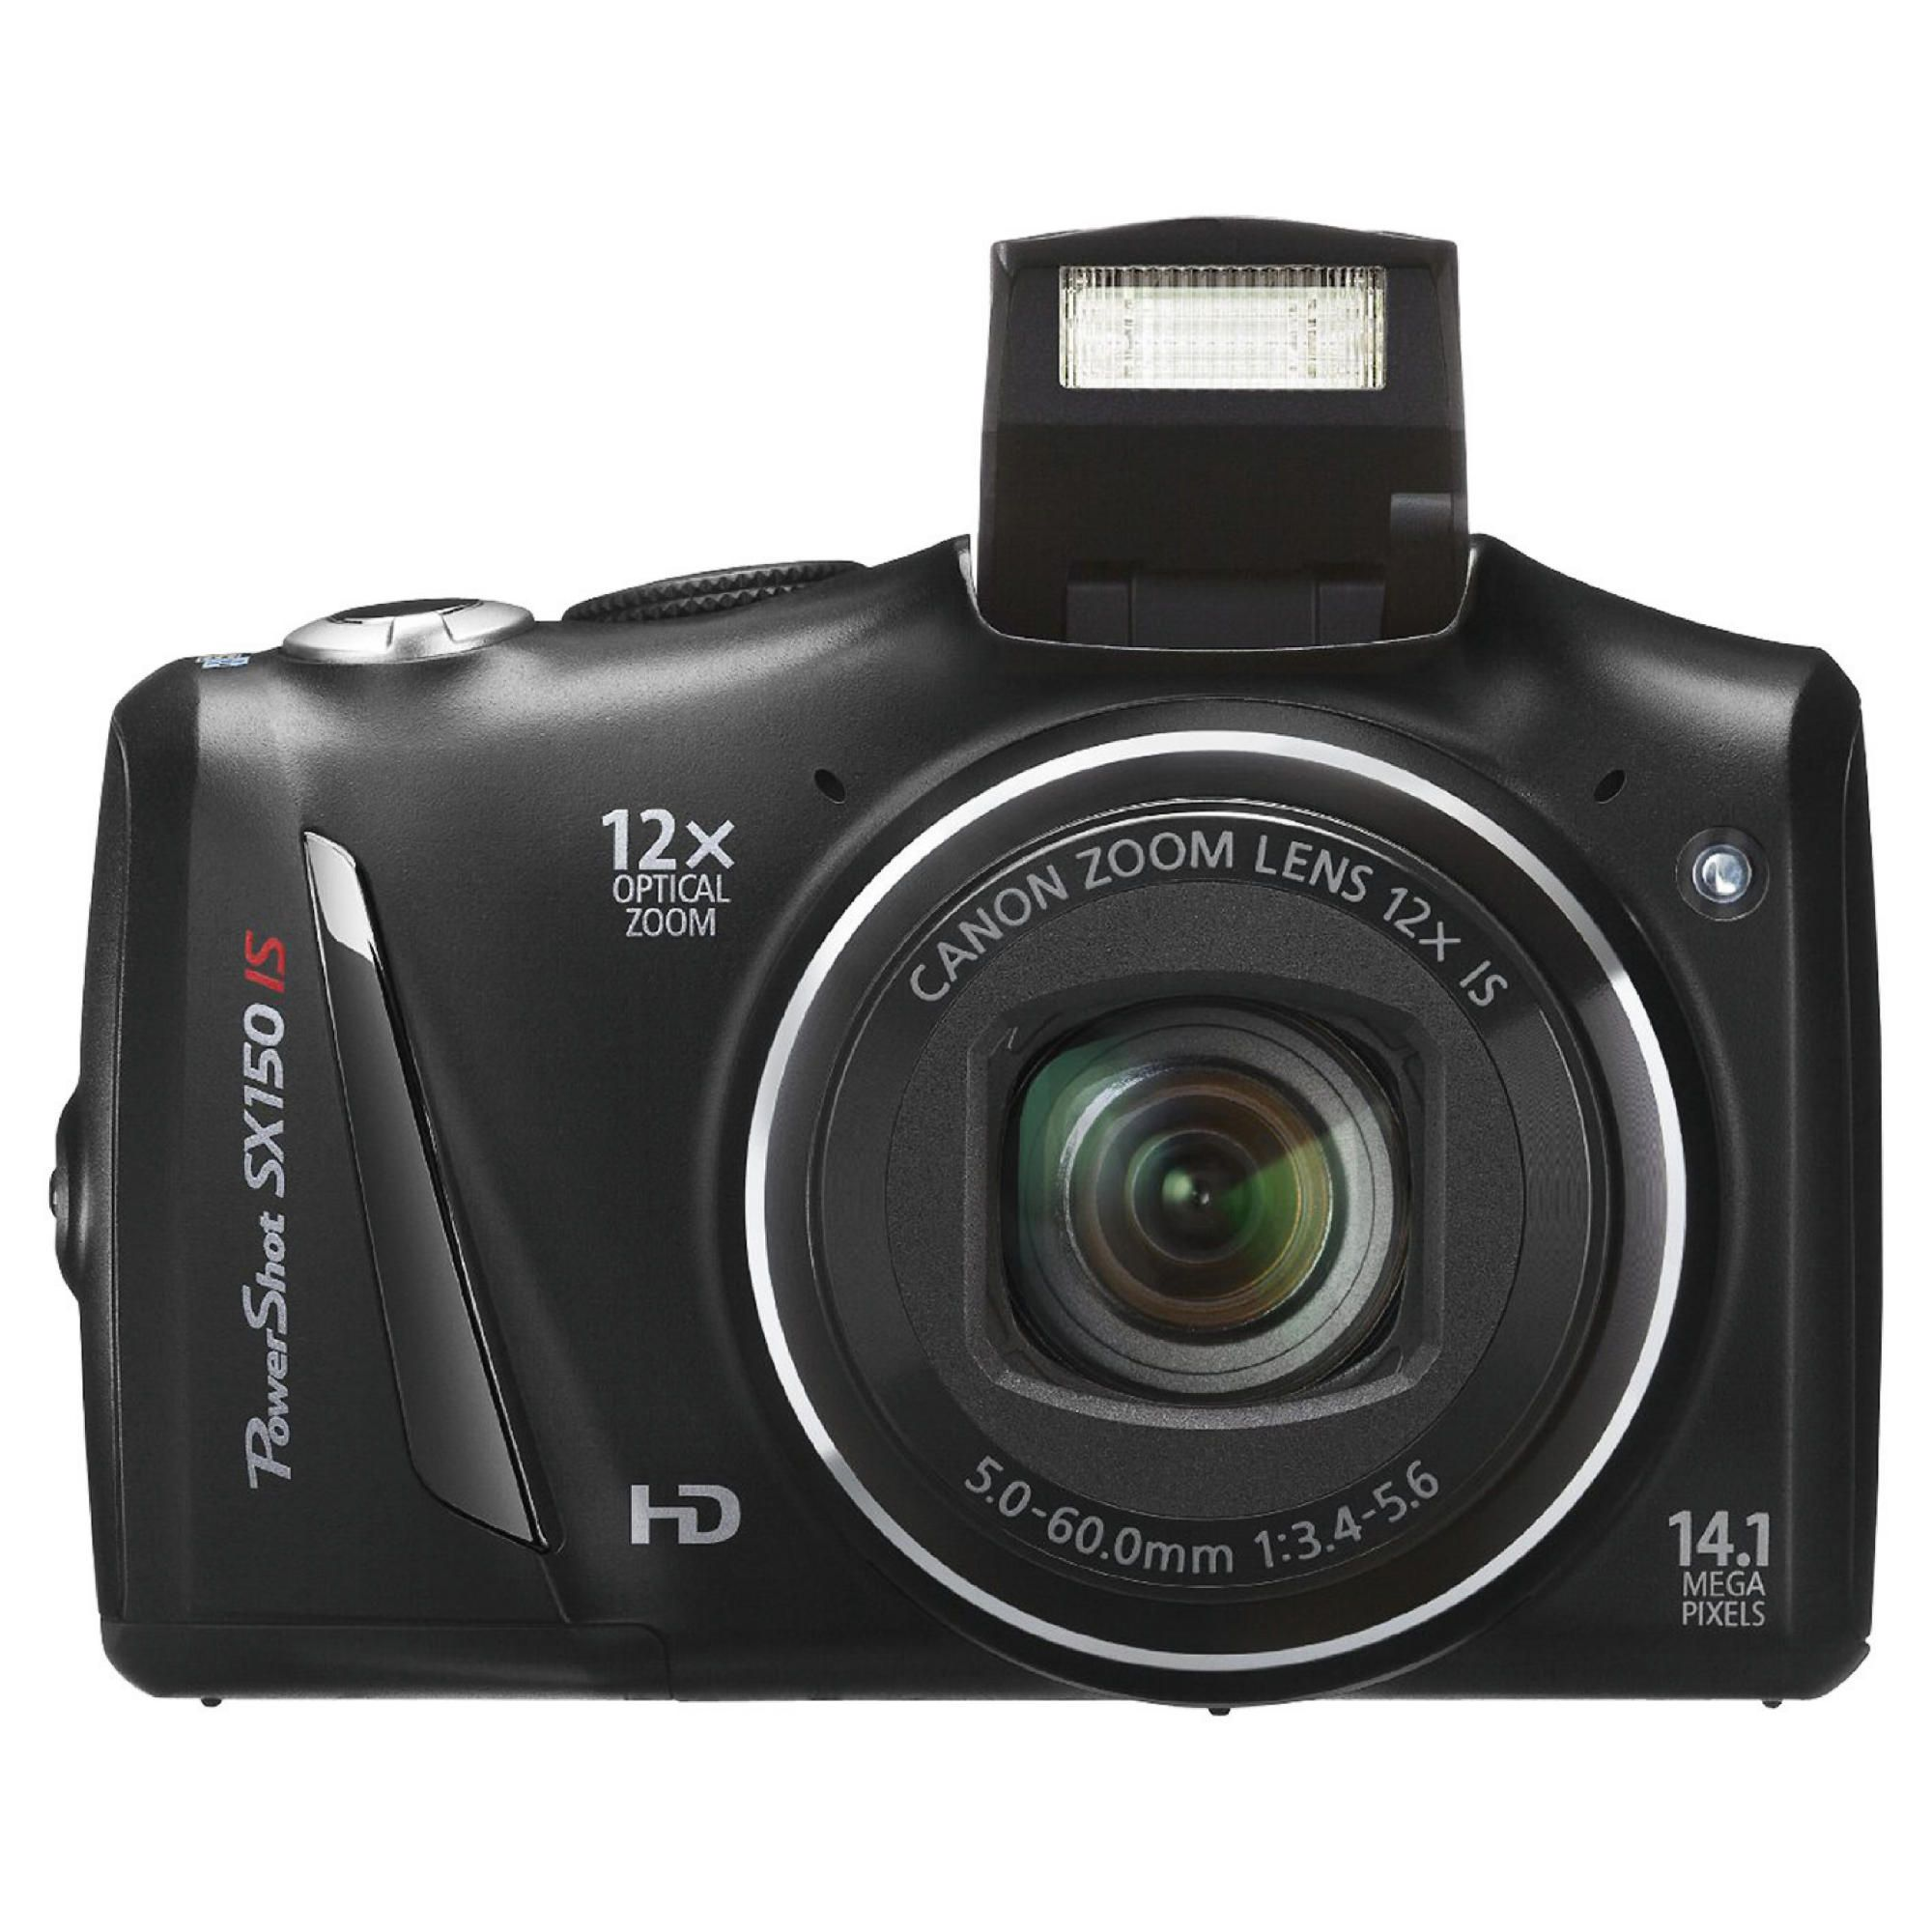 Canon Powershot SX150 IS Digital Camera Black